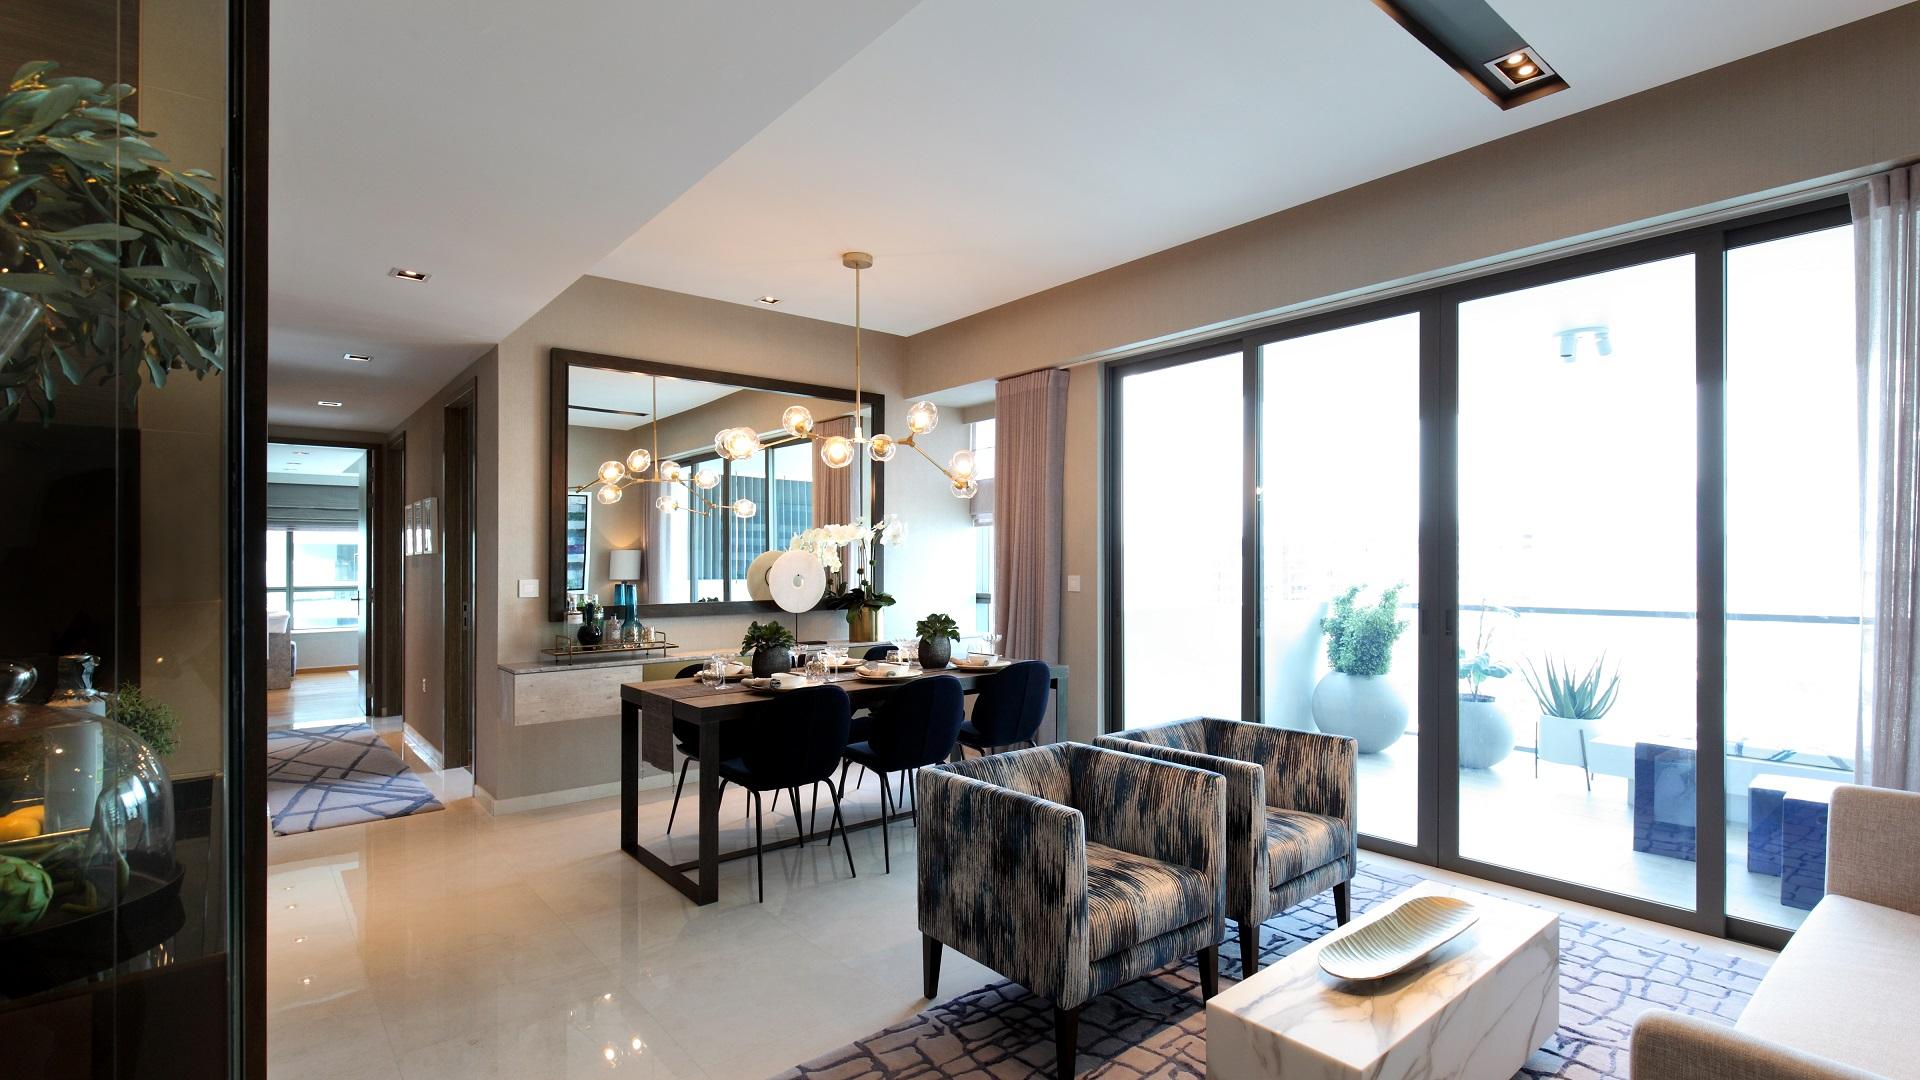 8 Saint Thomas living room 2 - EDGEPROP SINGAPORE